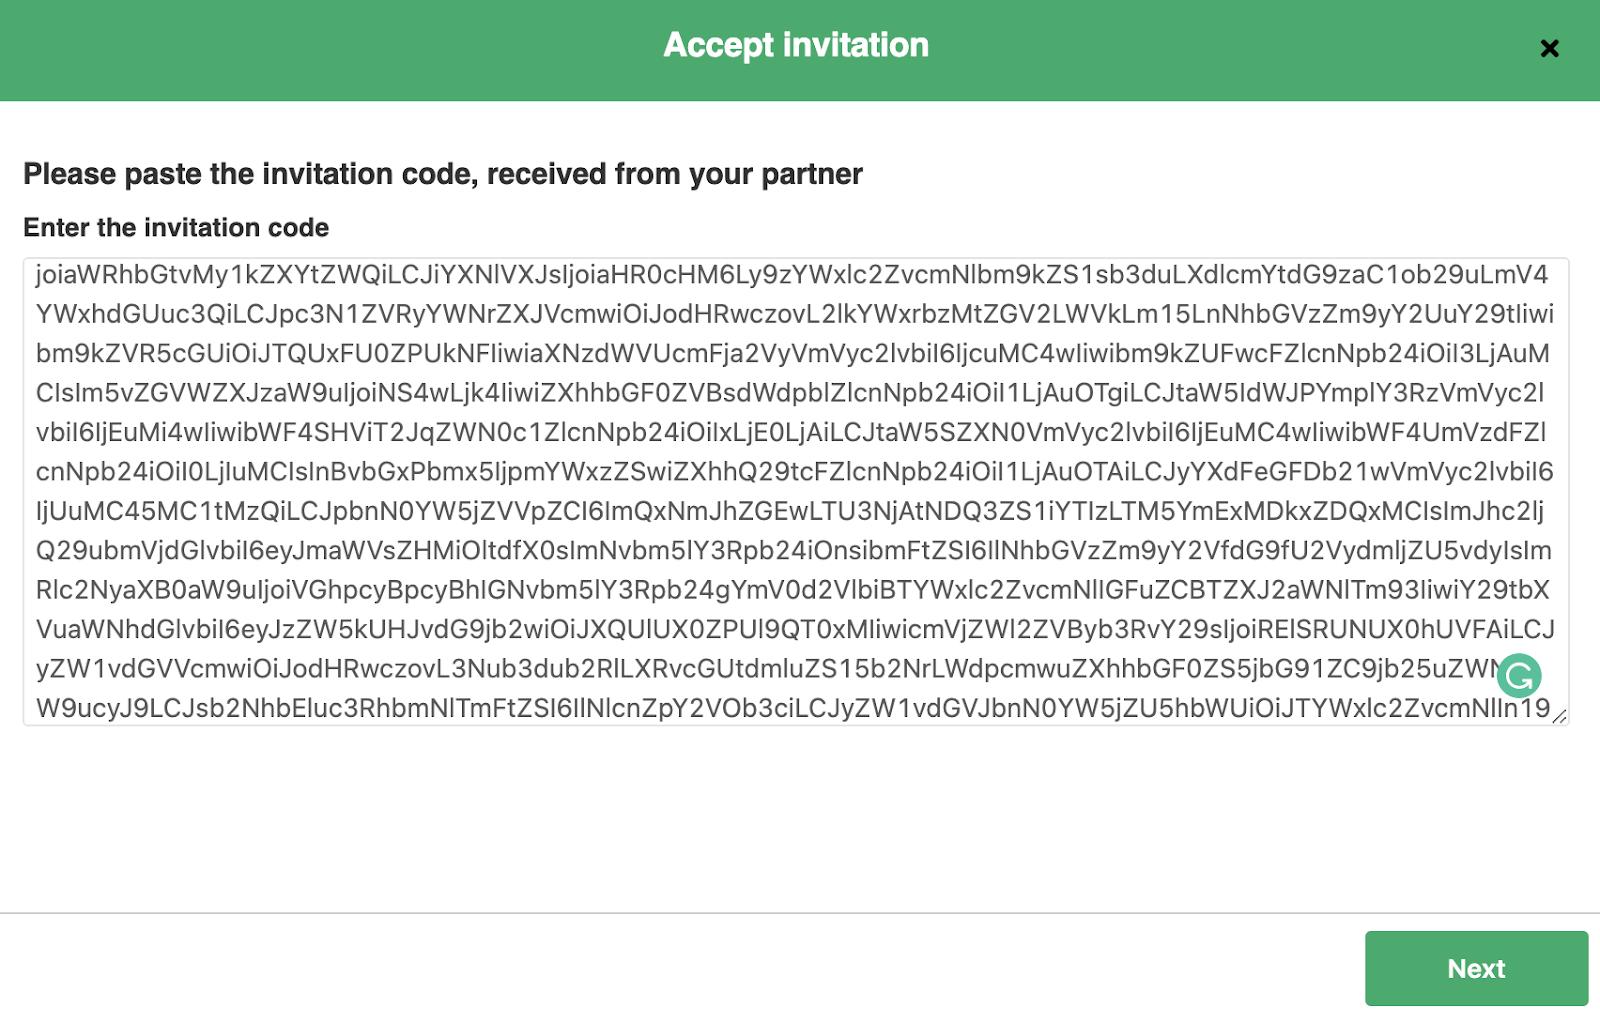 pase exalate invitation code